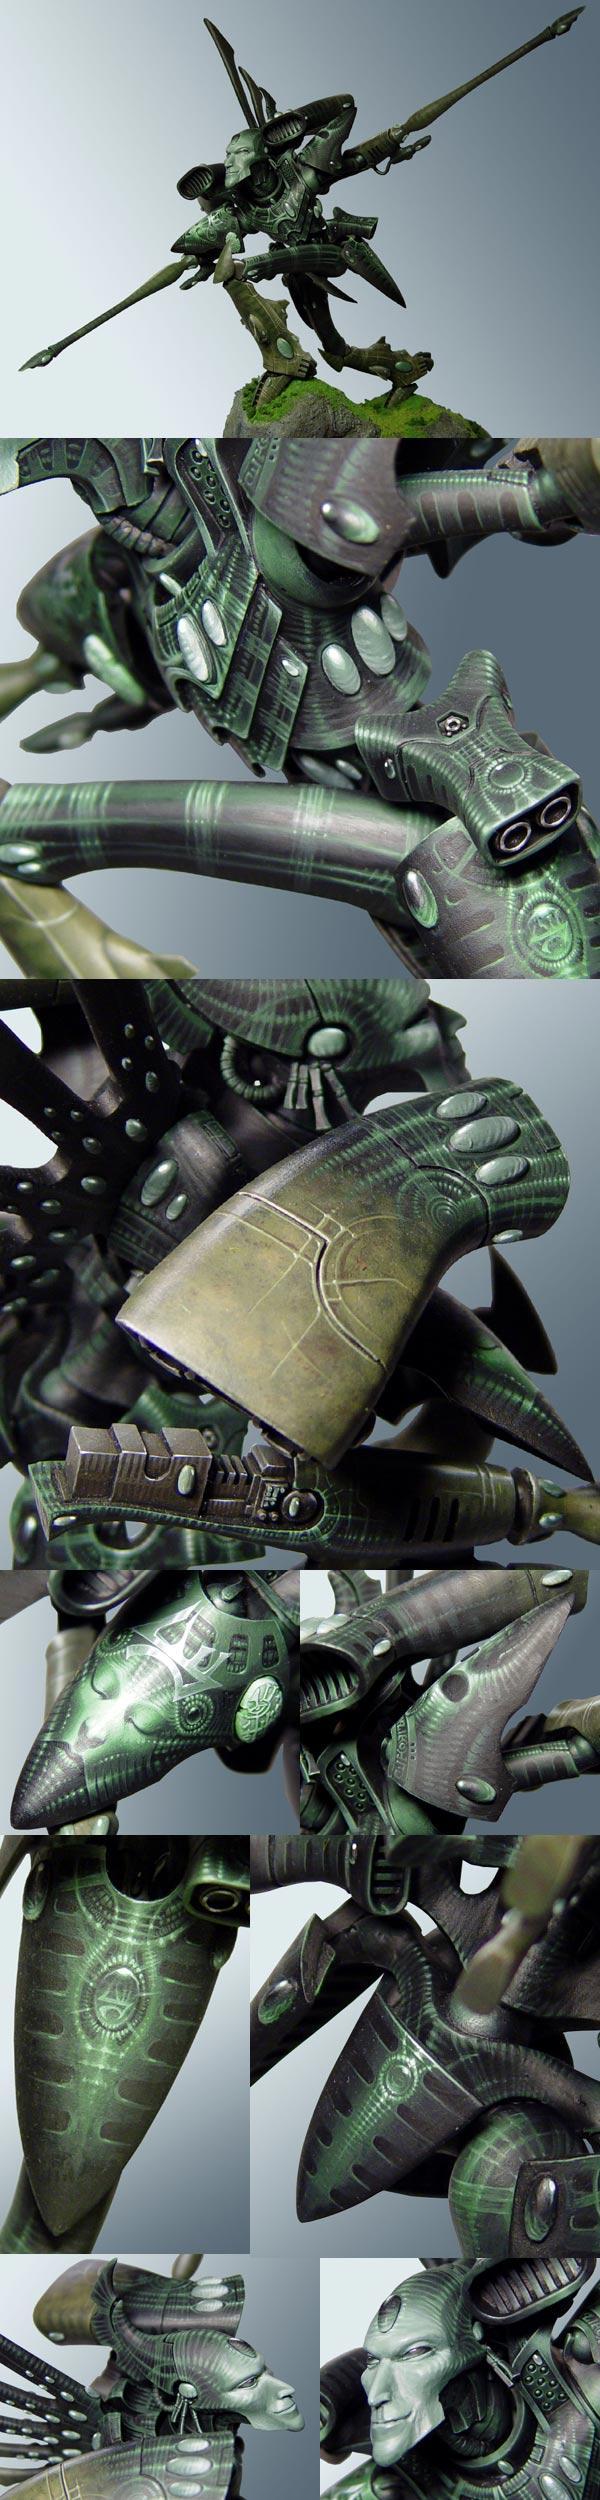 Apocalypse, Eldar, Forge World, Painted, Phantom, Titan, Warhammer 40,000